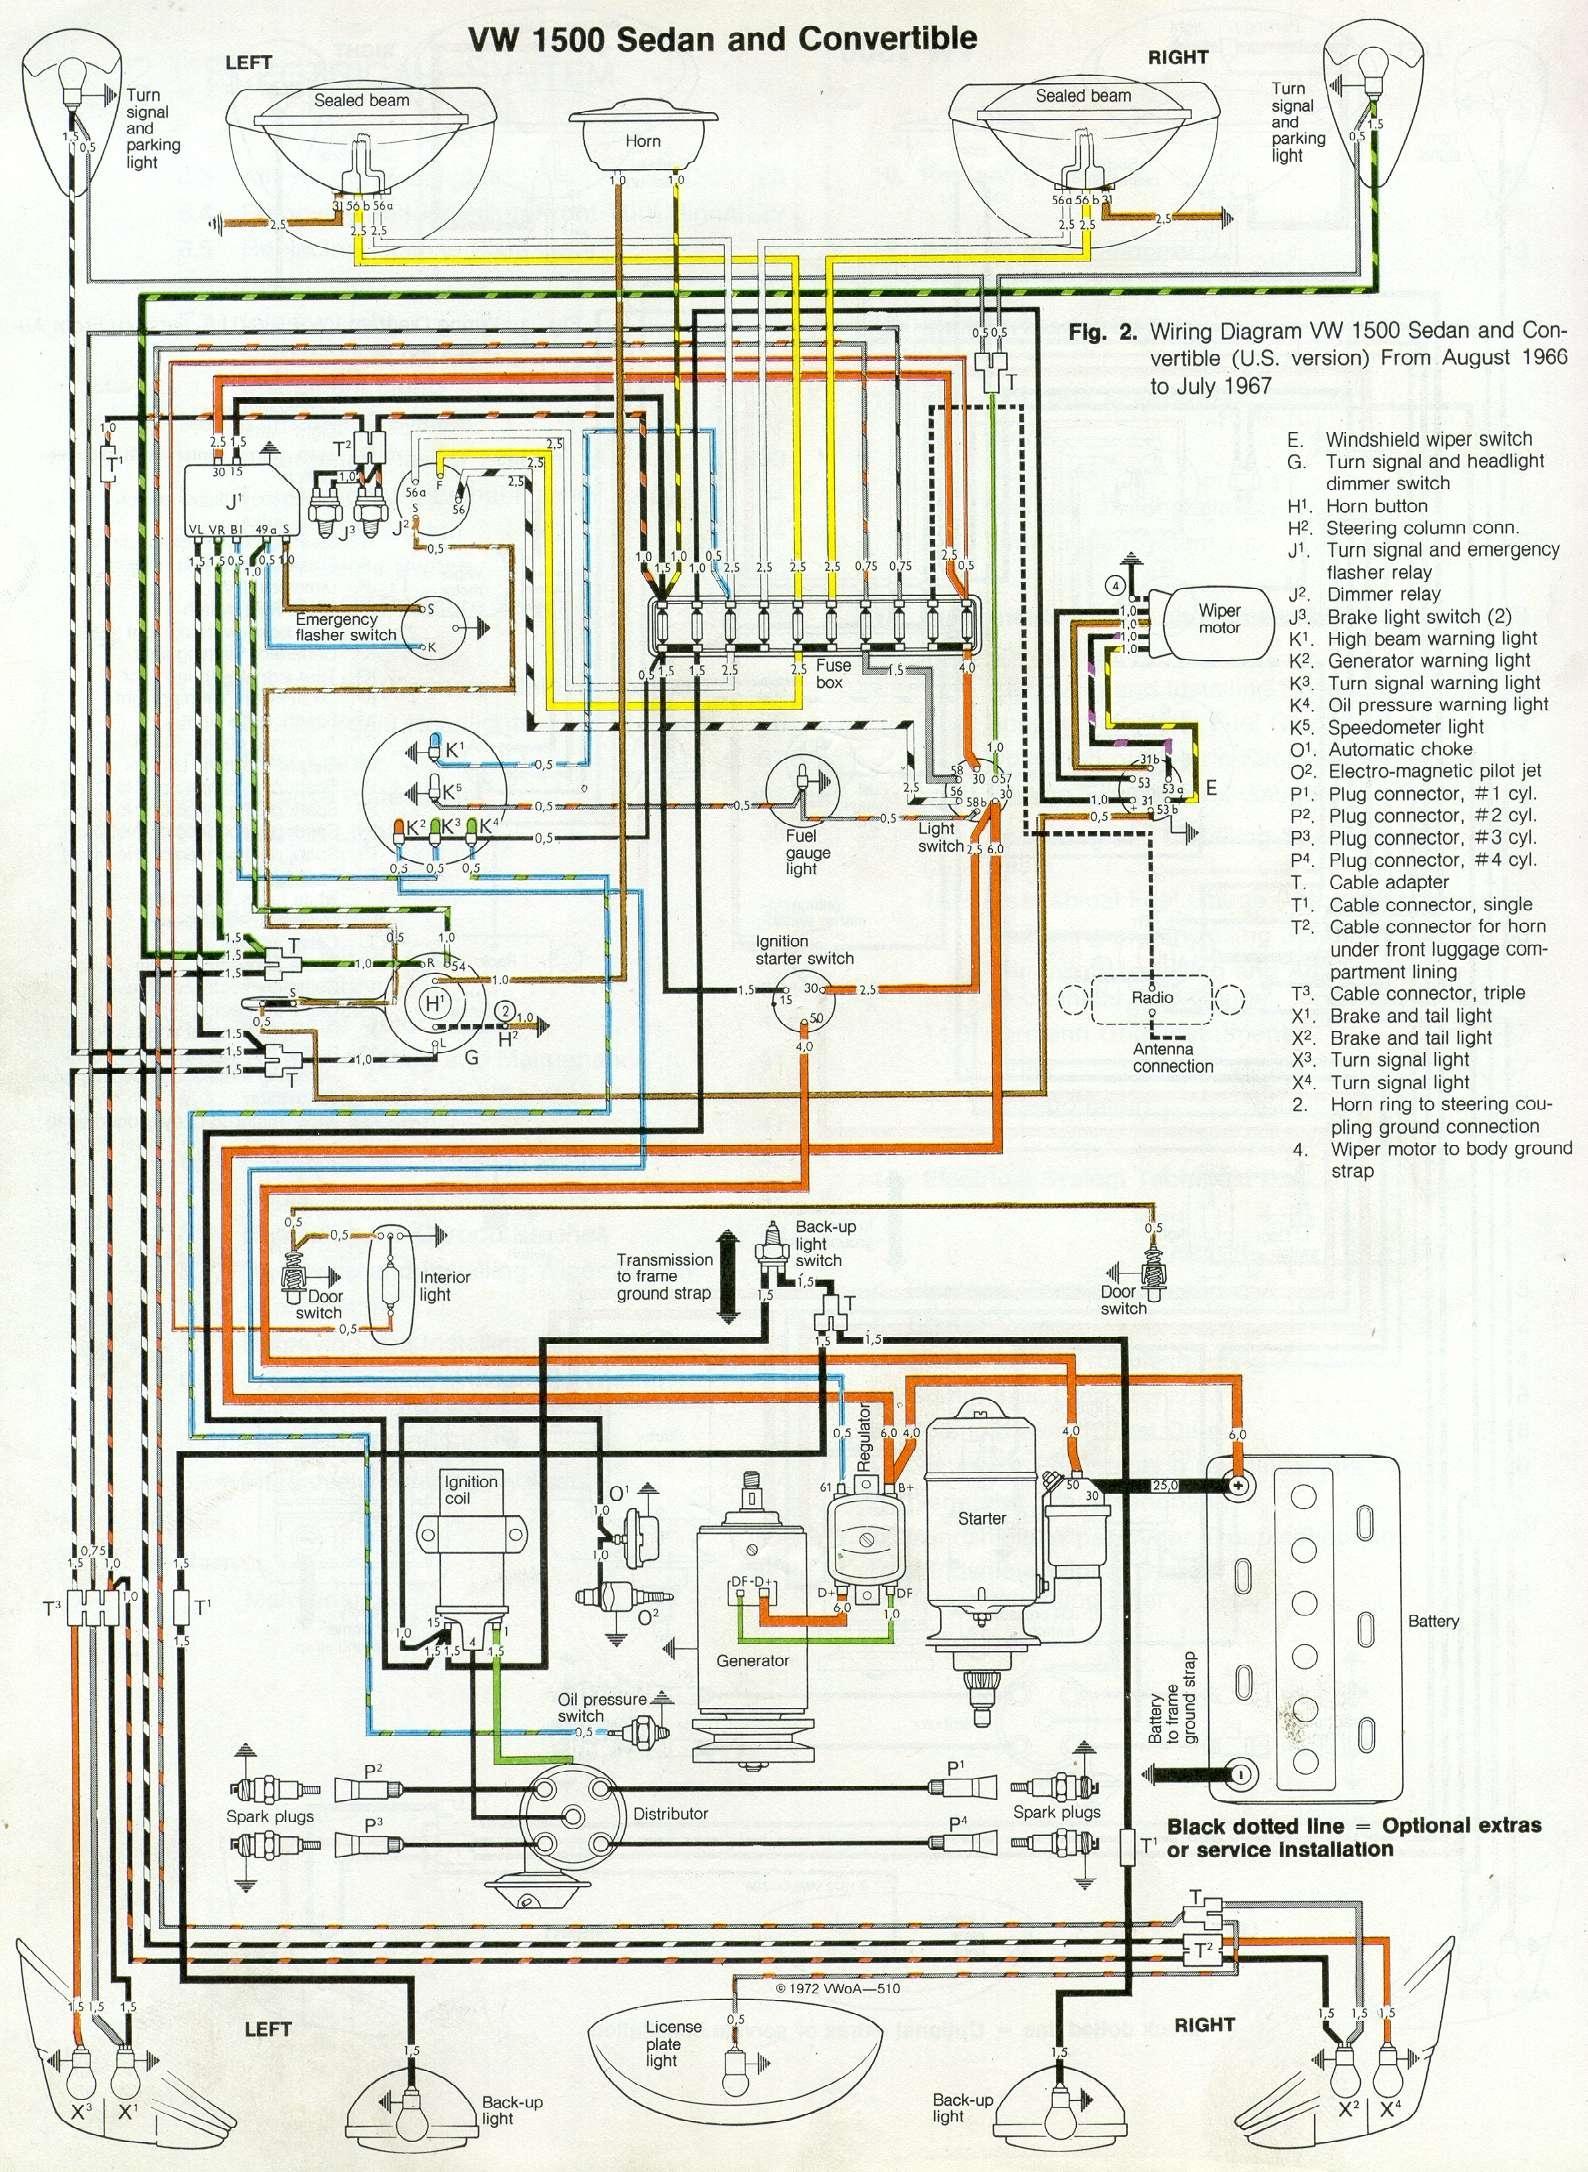 1967 vw wiring harness data wiring diagram update rh 2 lkjhg petersen guitars de